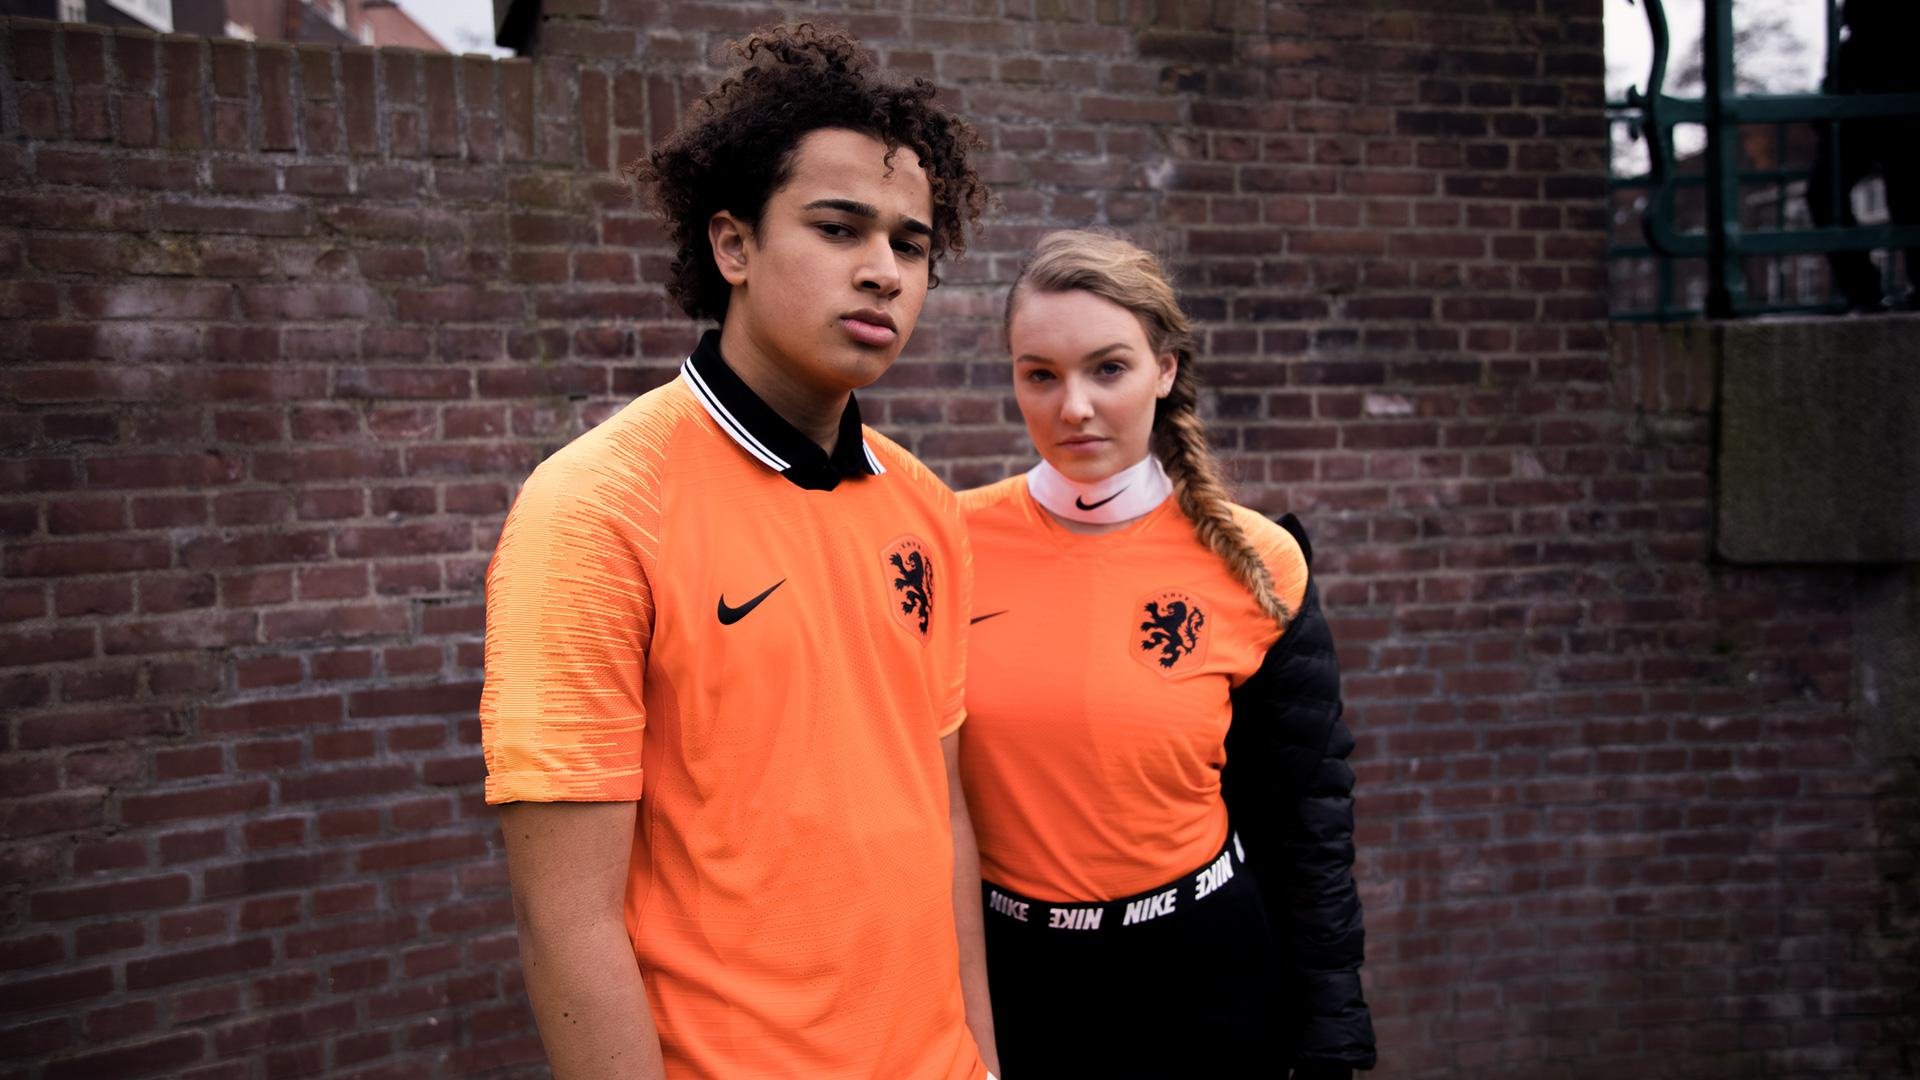 Nederlands Elftal shirt Frenkie de Jong